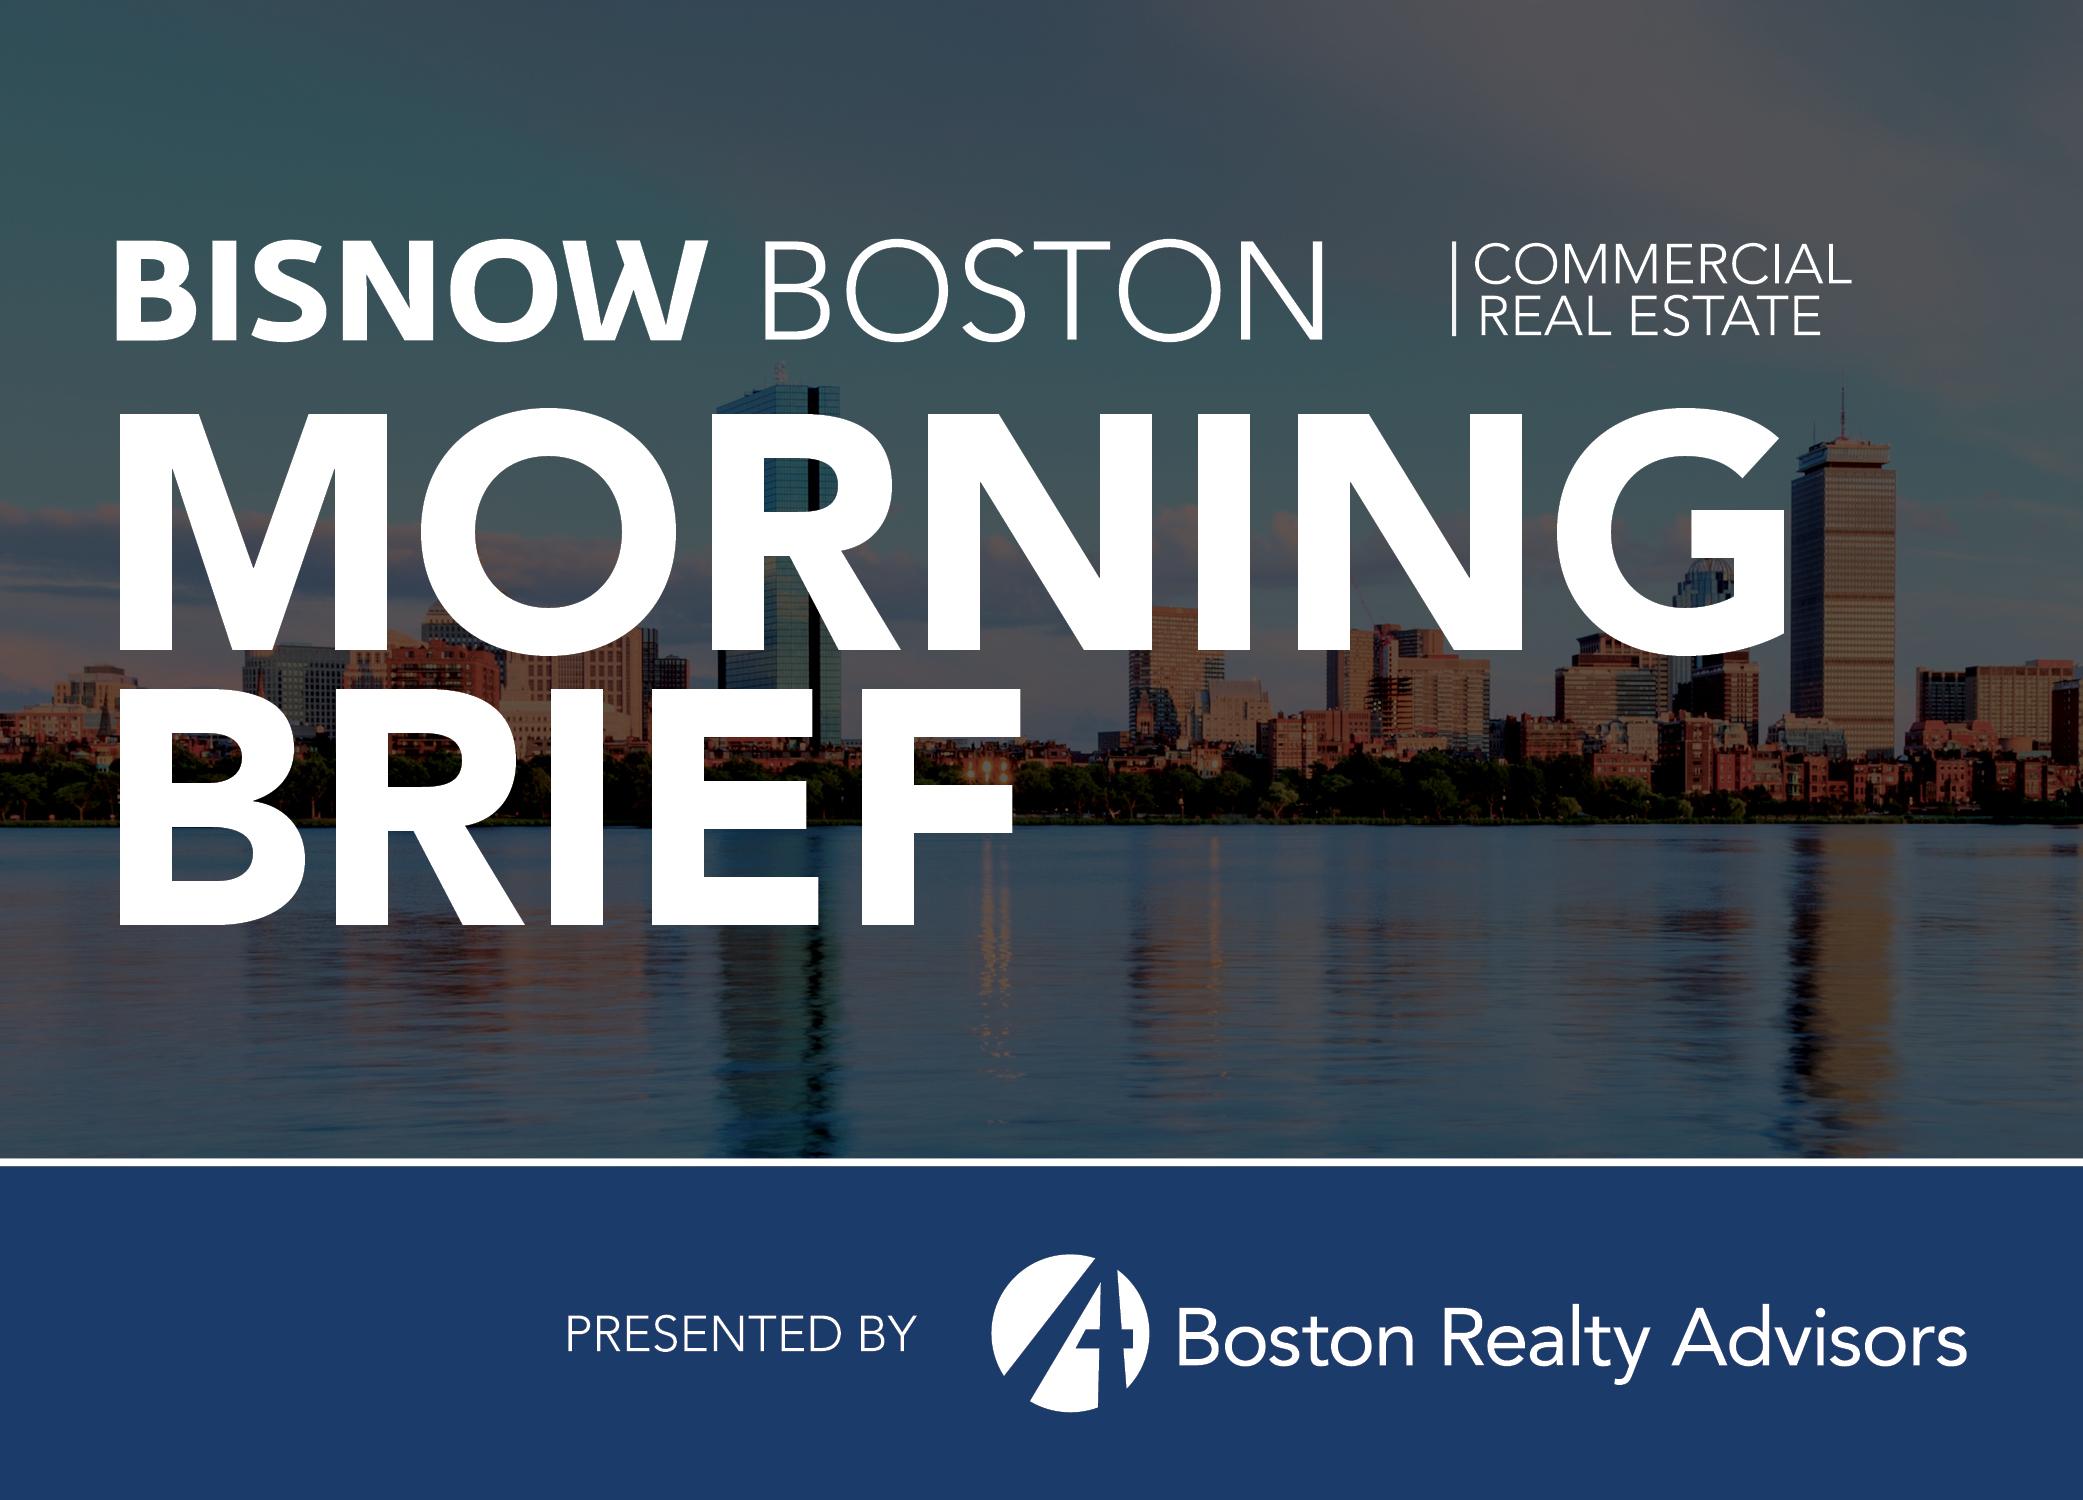 Bisnow Morning Brief Boston